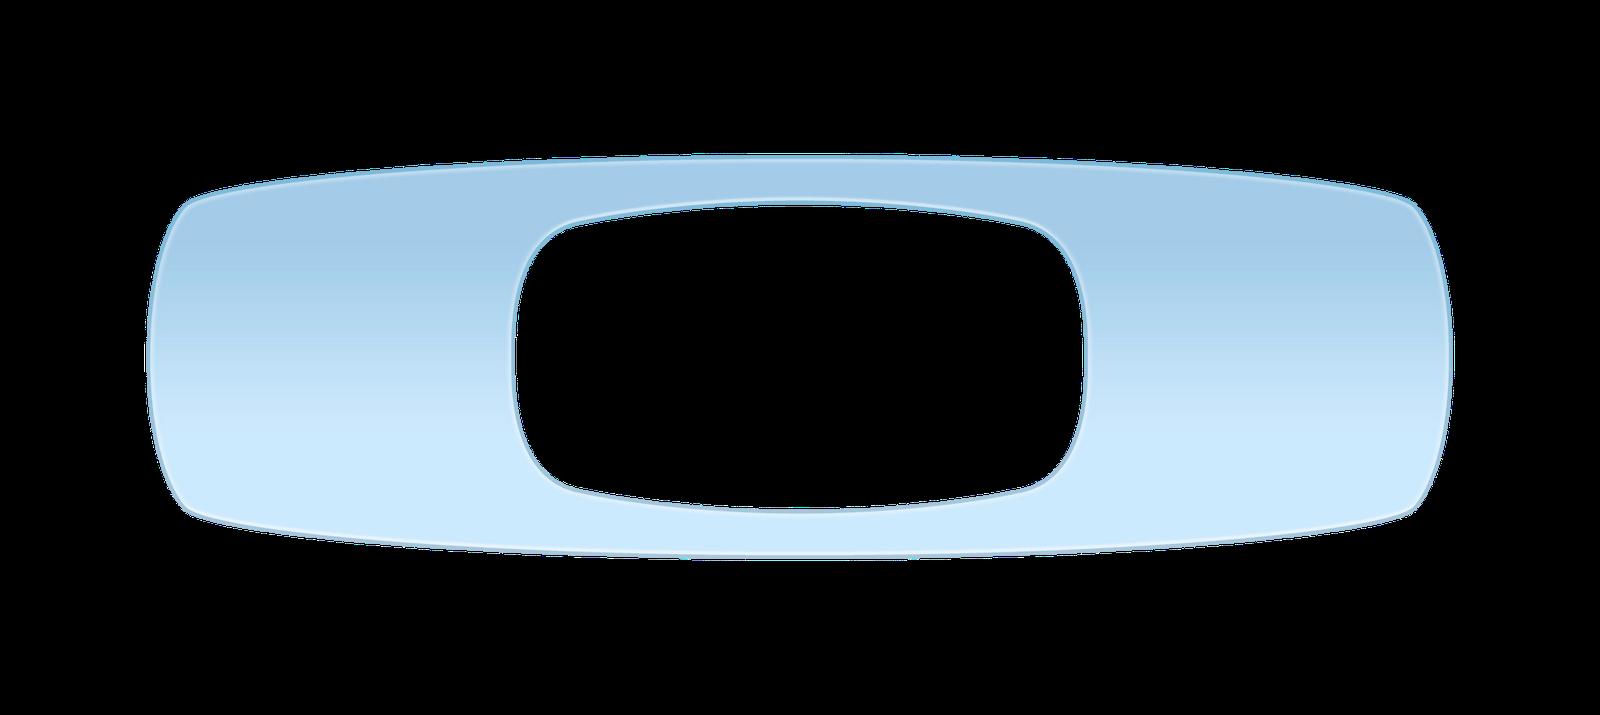 oakley logo png displaying 19 images for oakley logo png toolbar